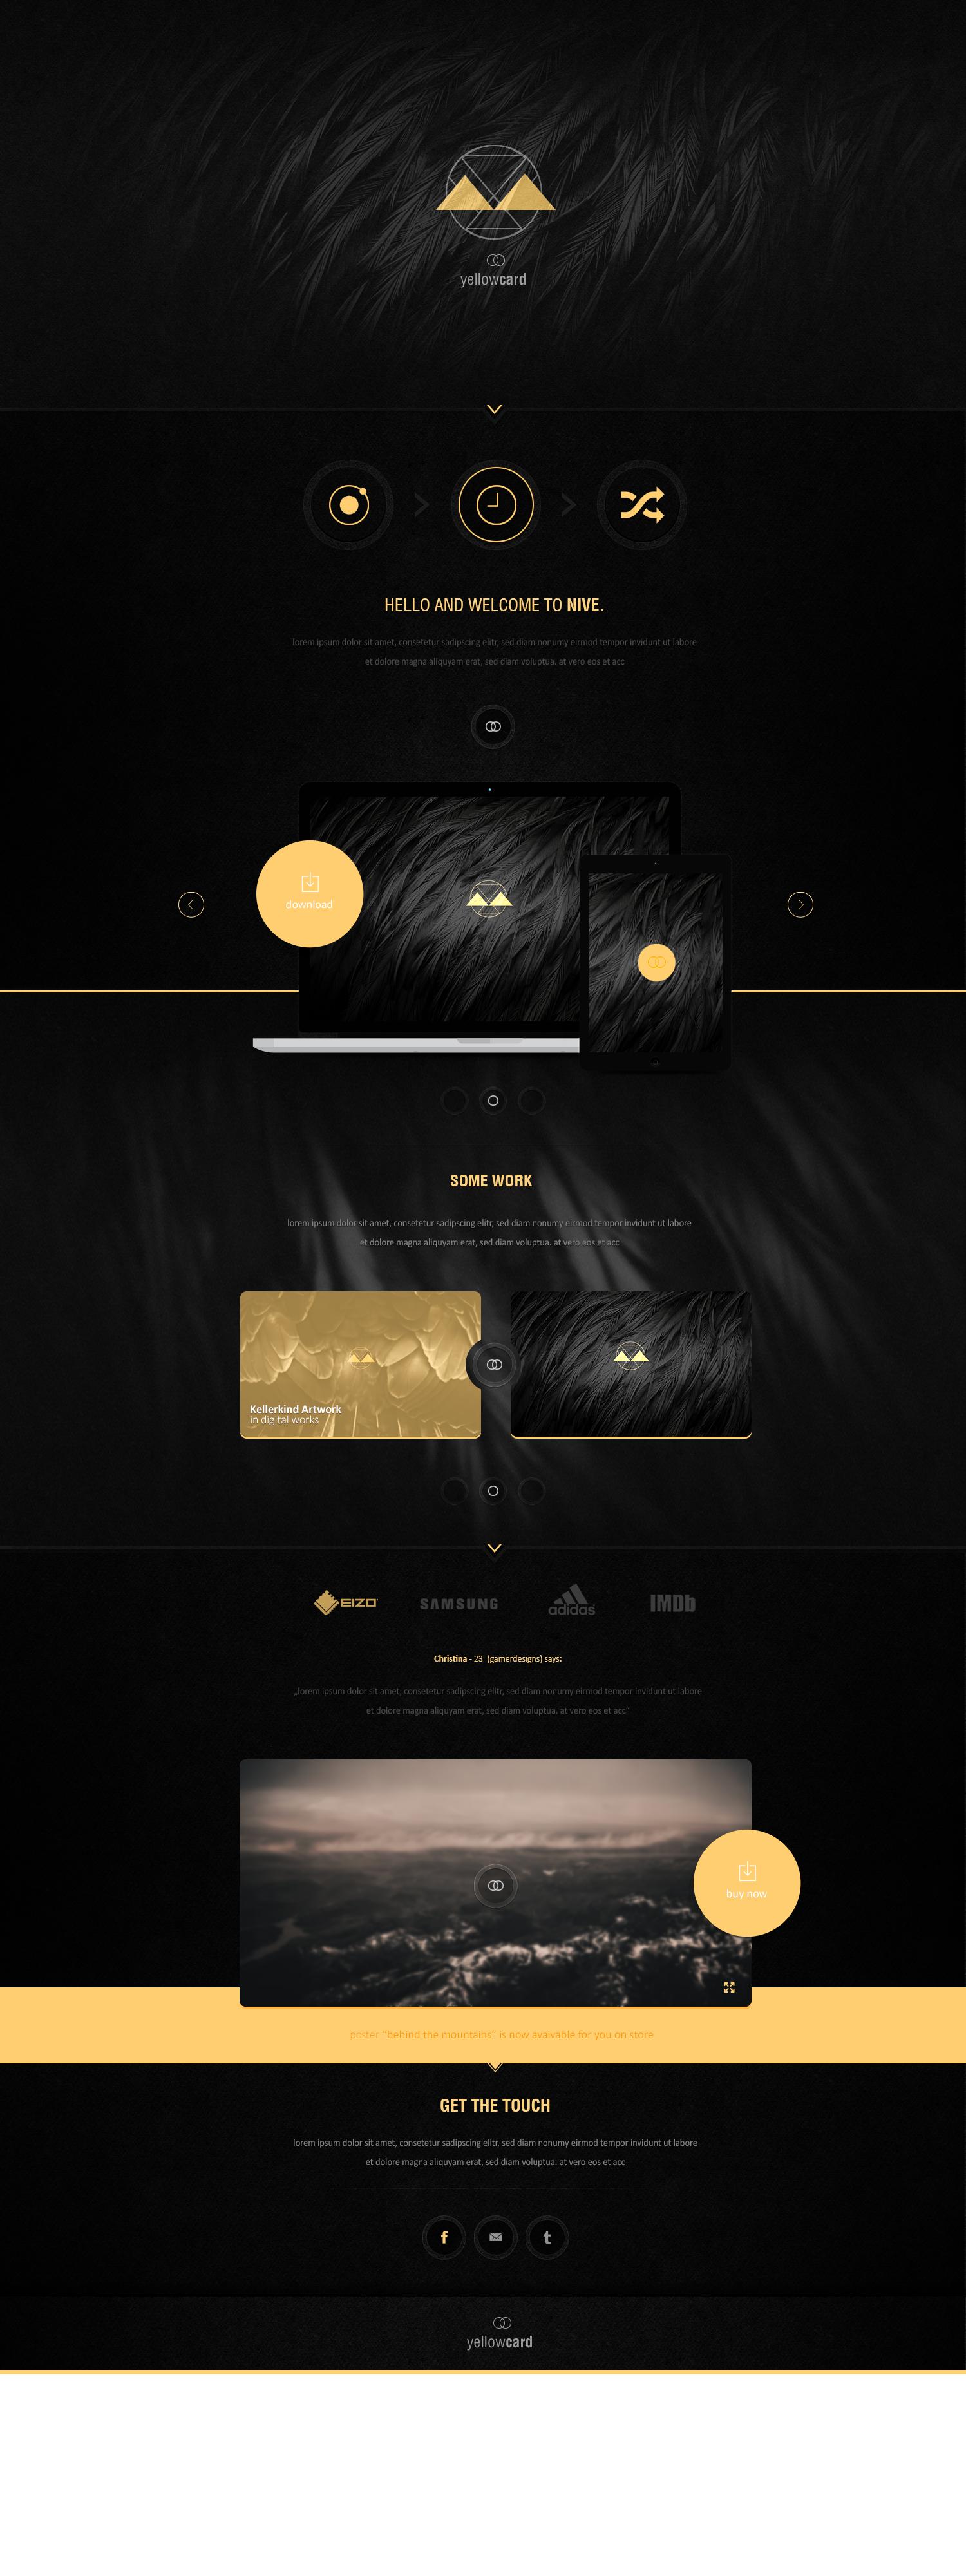 yellowcard -sold- by schuetzthomas